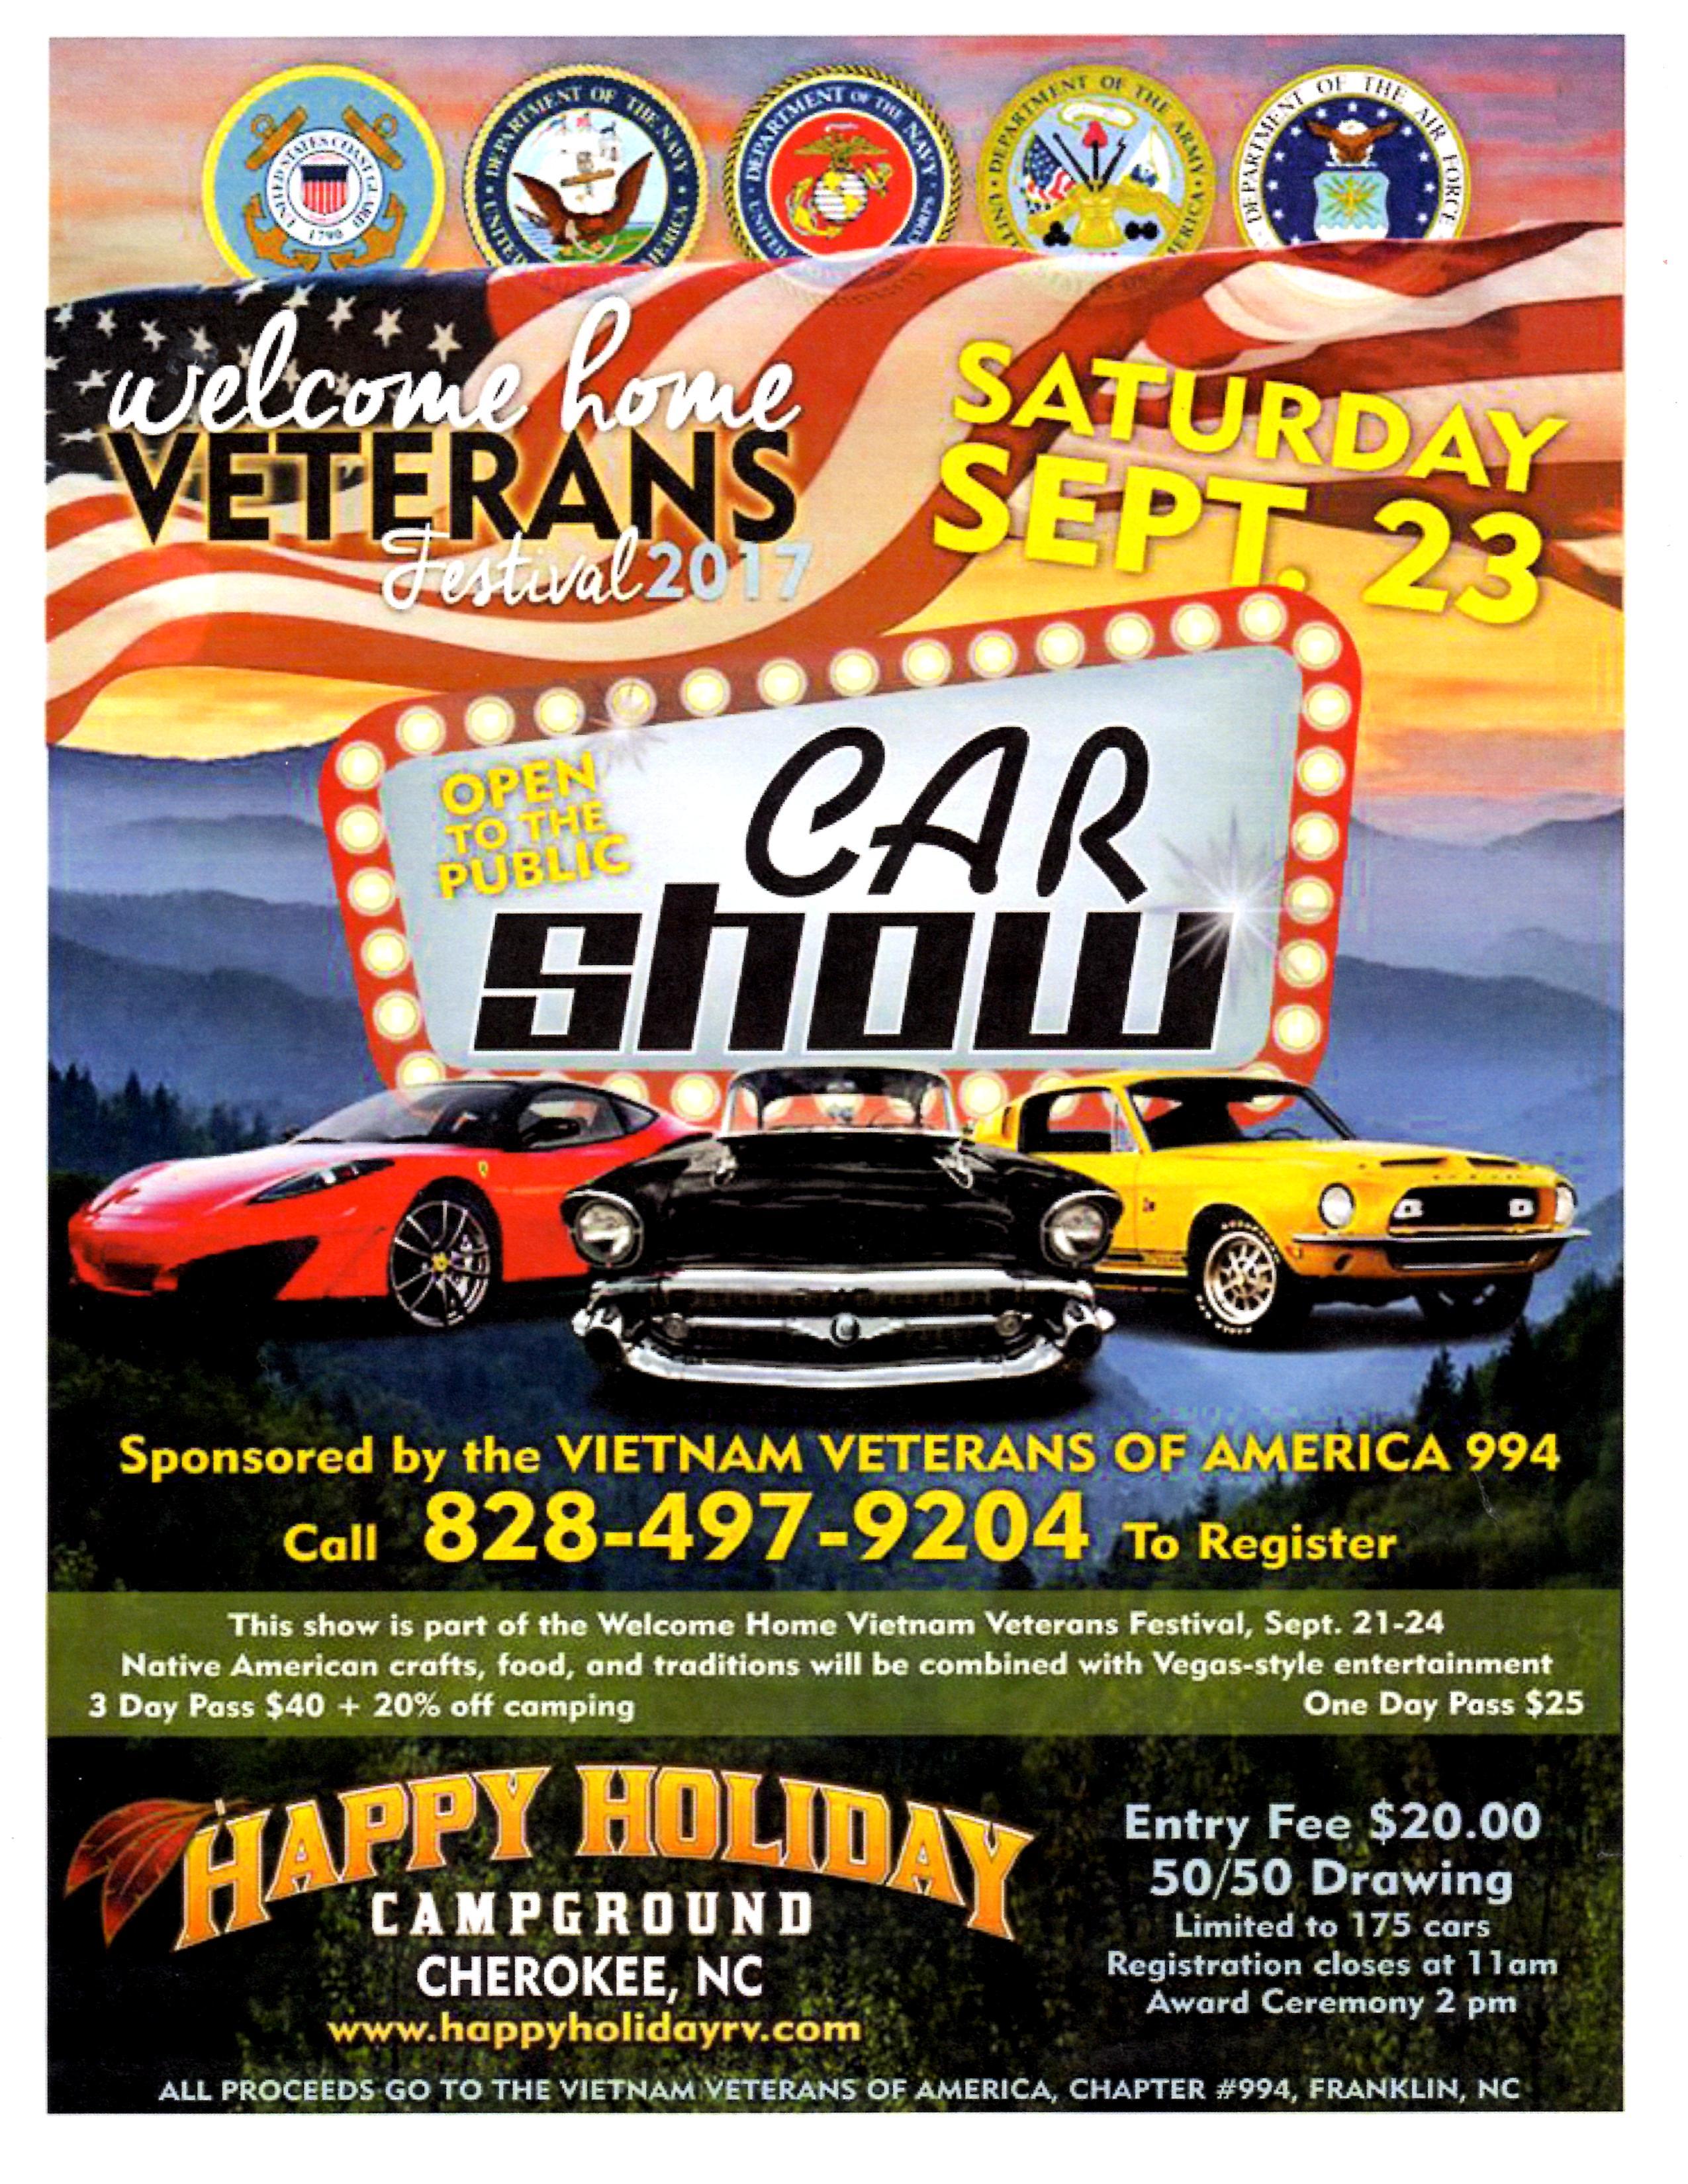 Calendar - Virginia beach cruise in car show